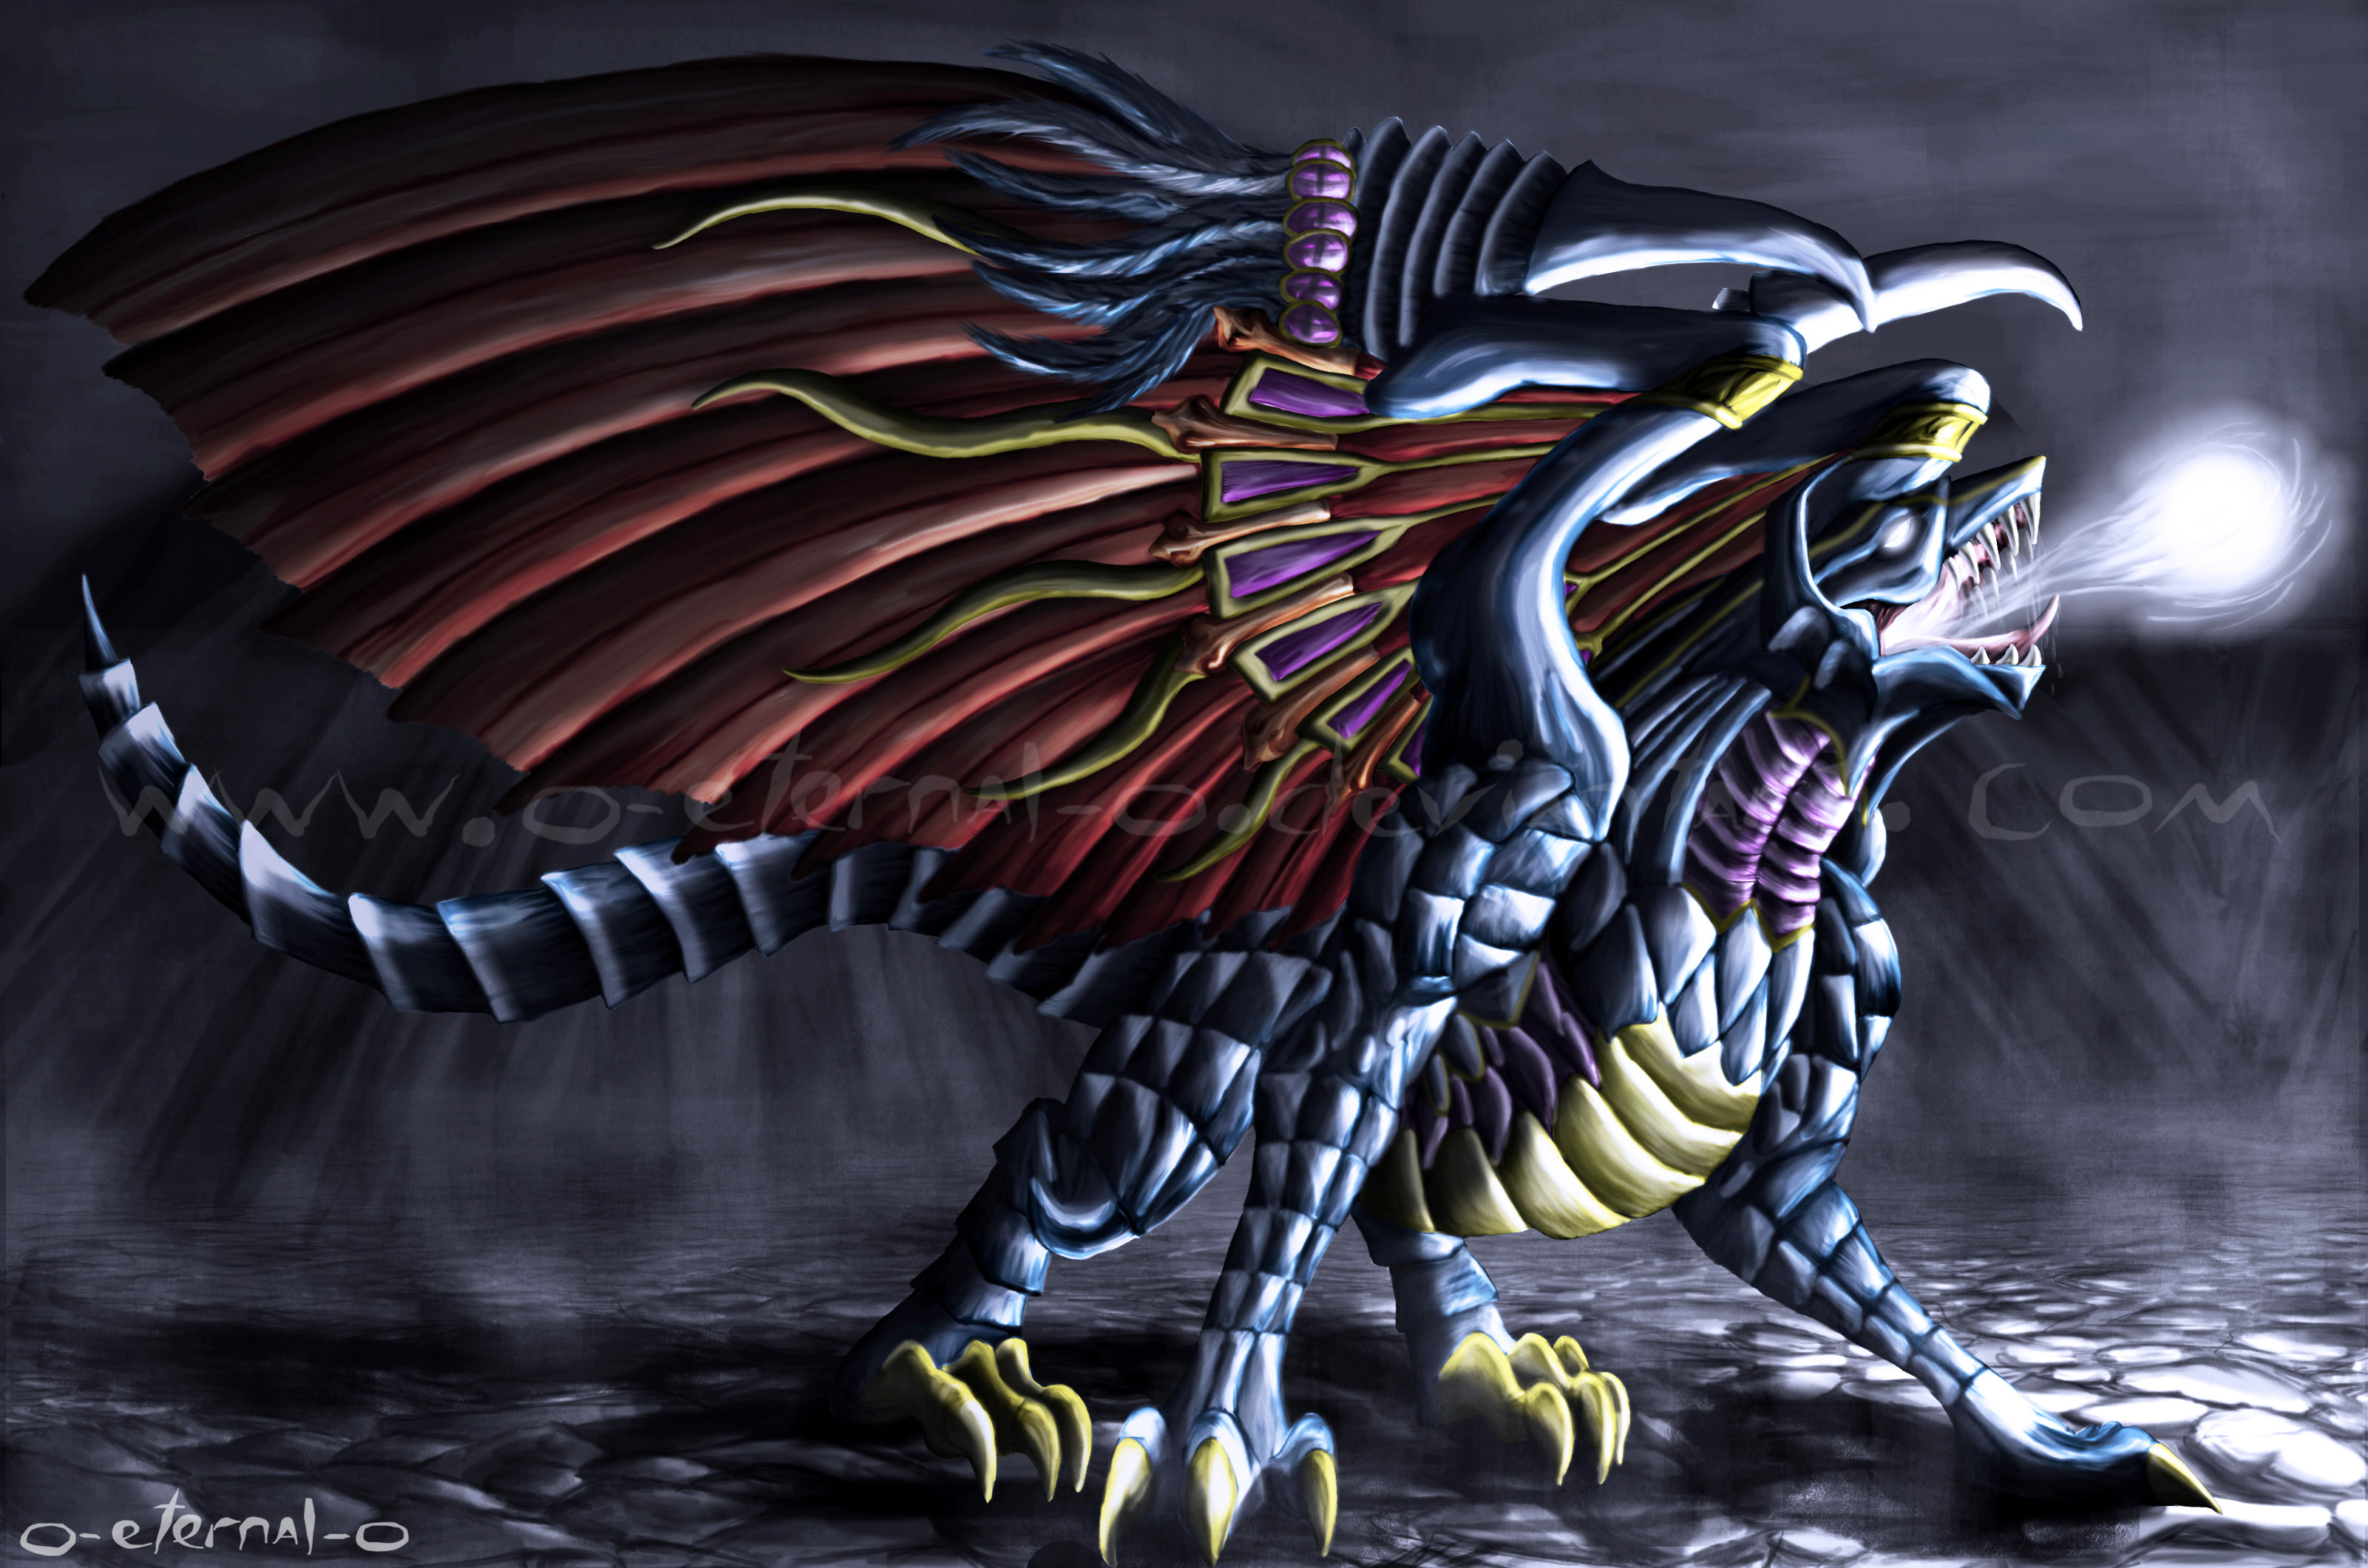 Rolea tu Imperio - Volumen IV: El último trabajo - Página 64 Bahamut_Dragon_King_by_o_eternal_o